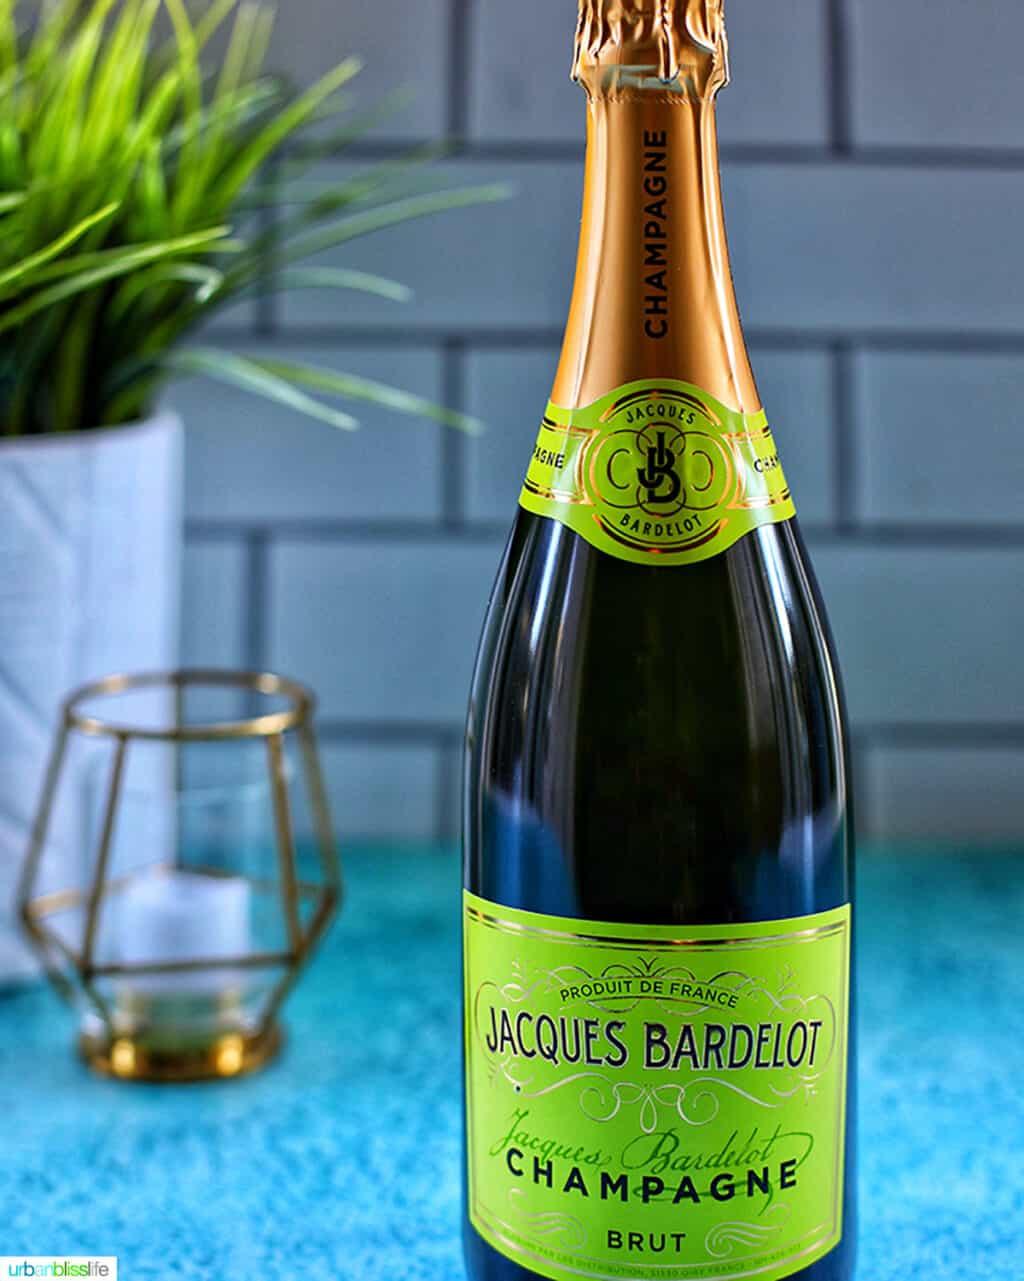 Jacques Bardelot Champagne bottle